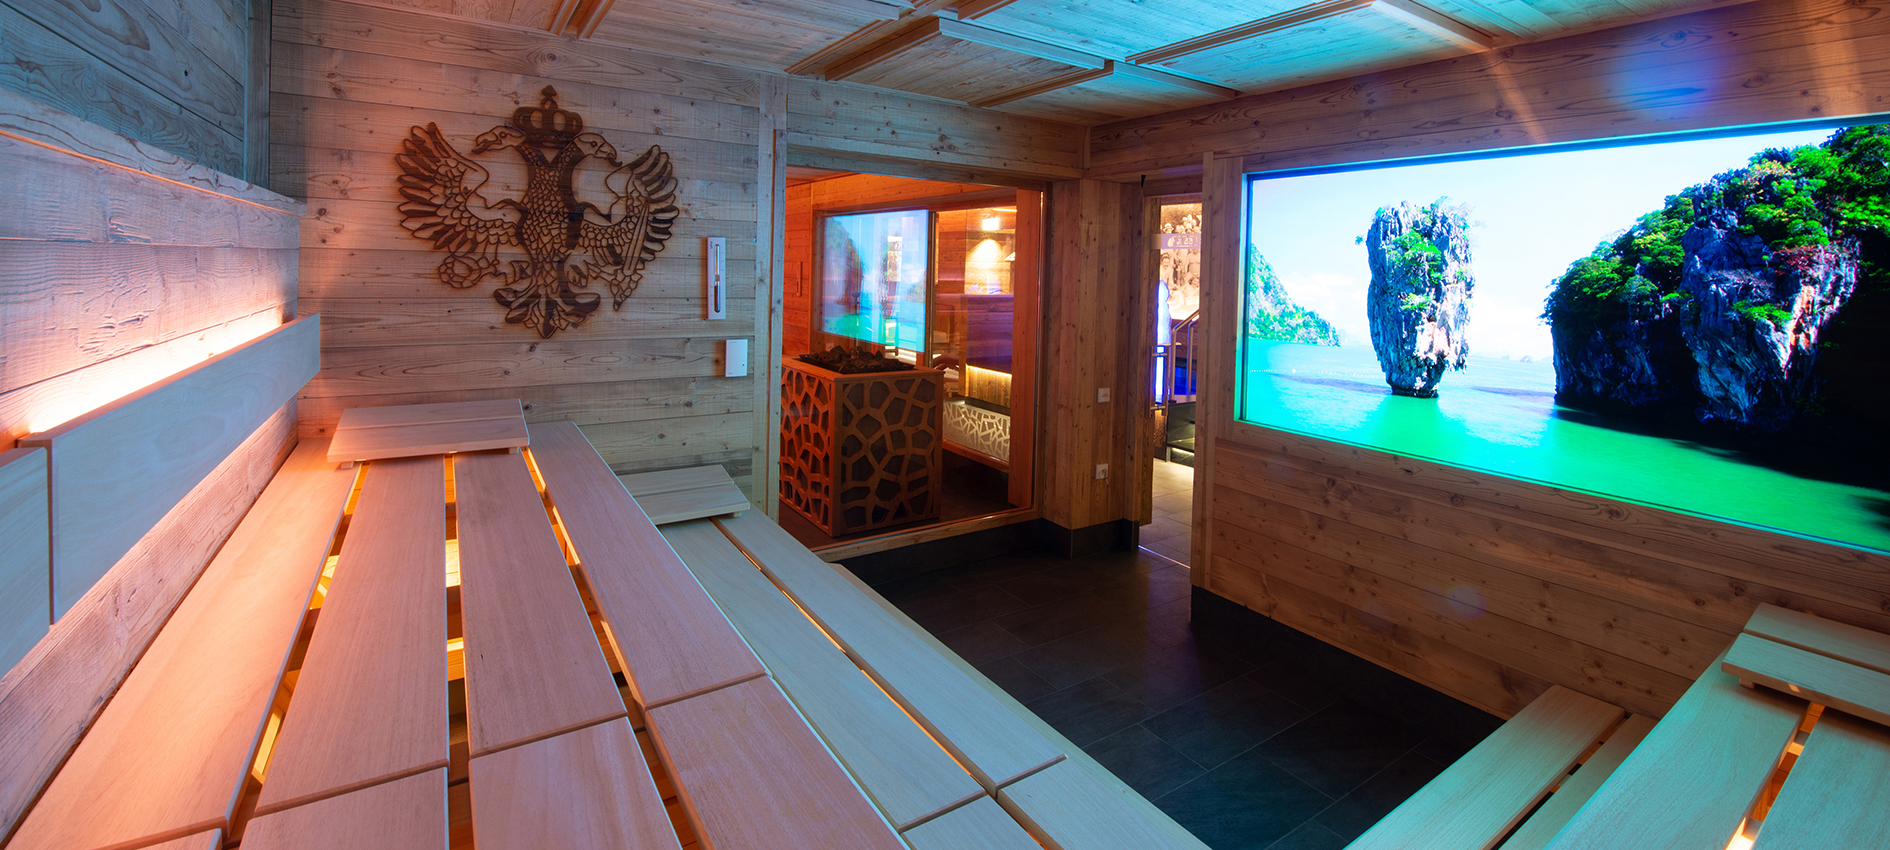 Saunarium im Unterallgäu Hotel-Gasthof Adler